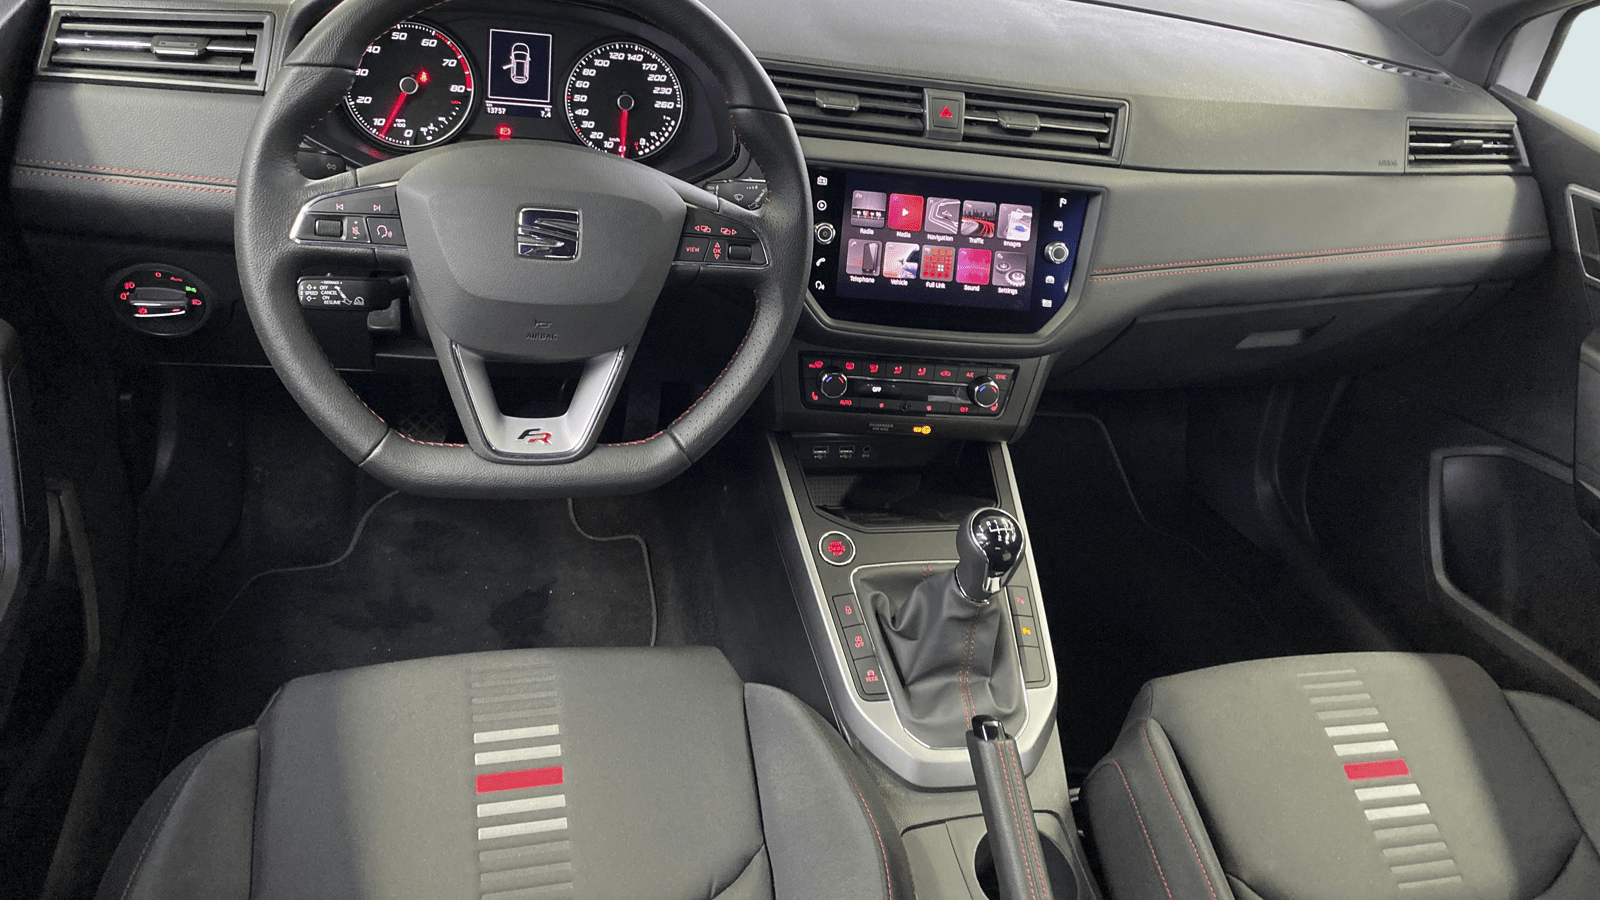 SEAT Arona Weiss interior - Clyde Auto-Abo